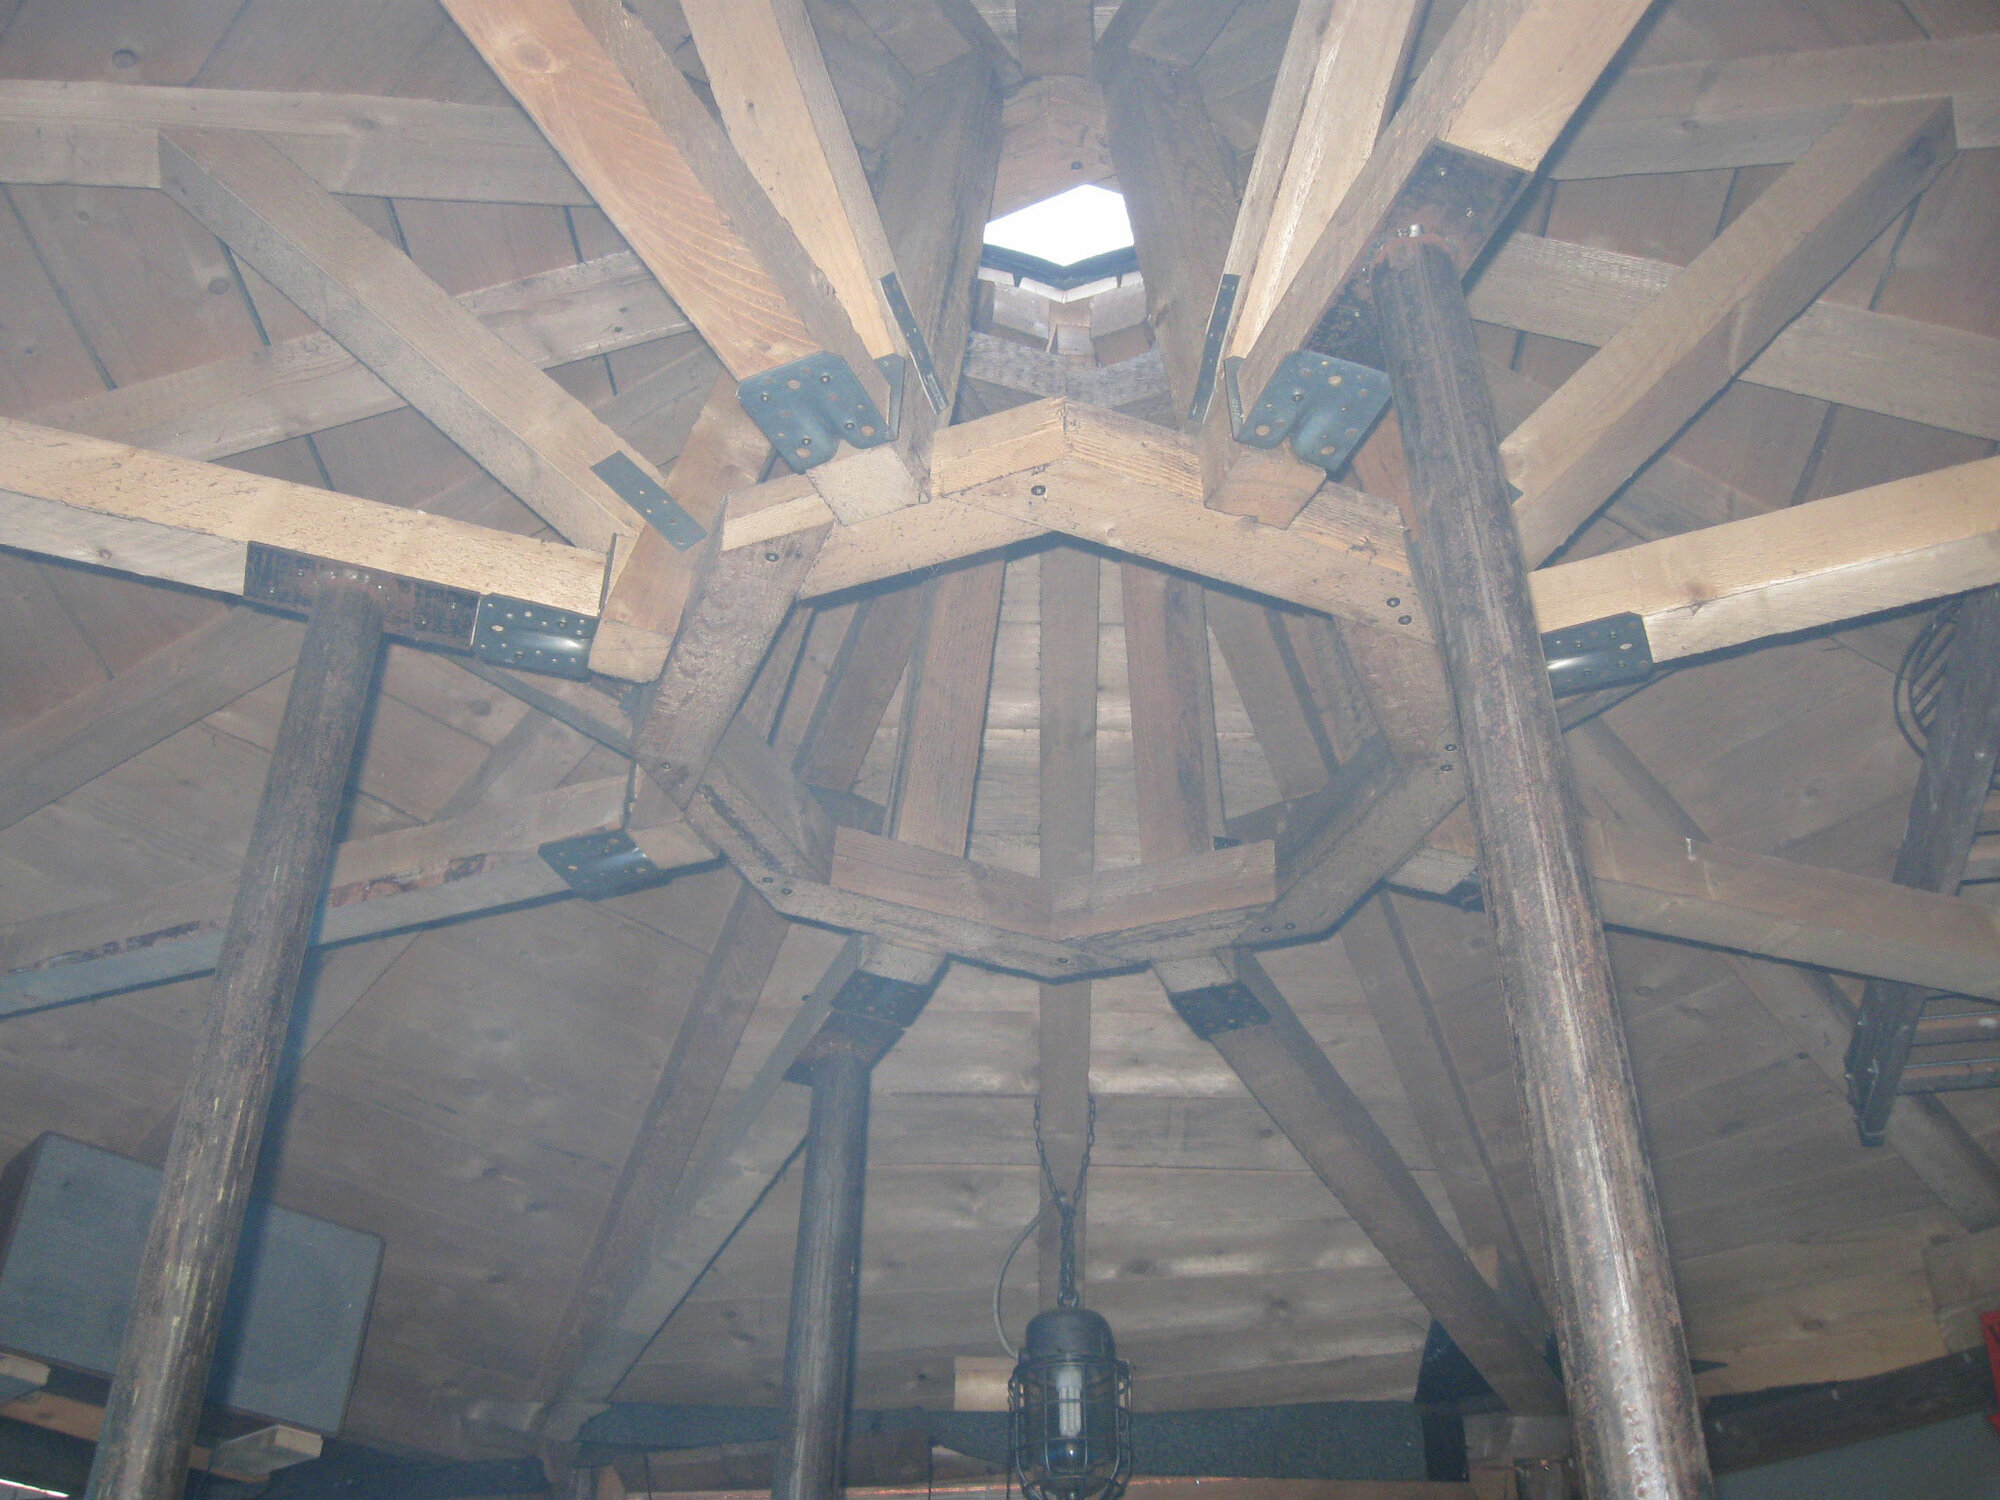 grillhütte14web.jpg